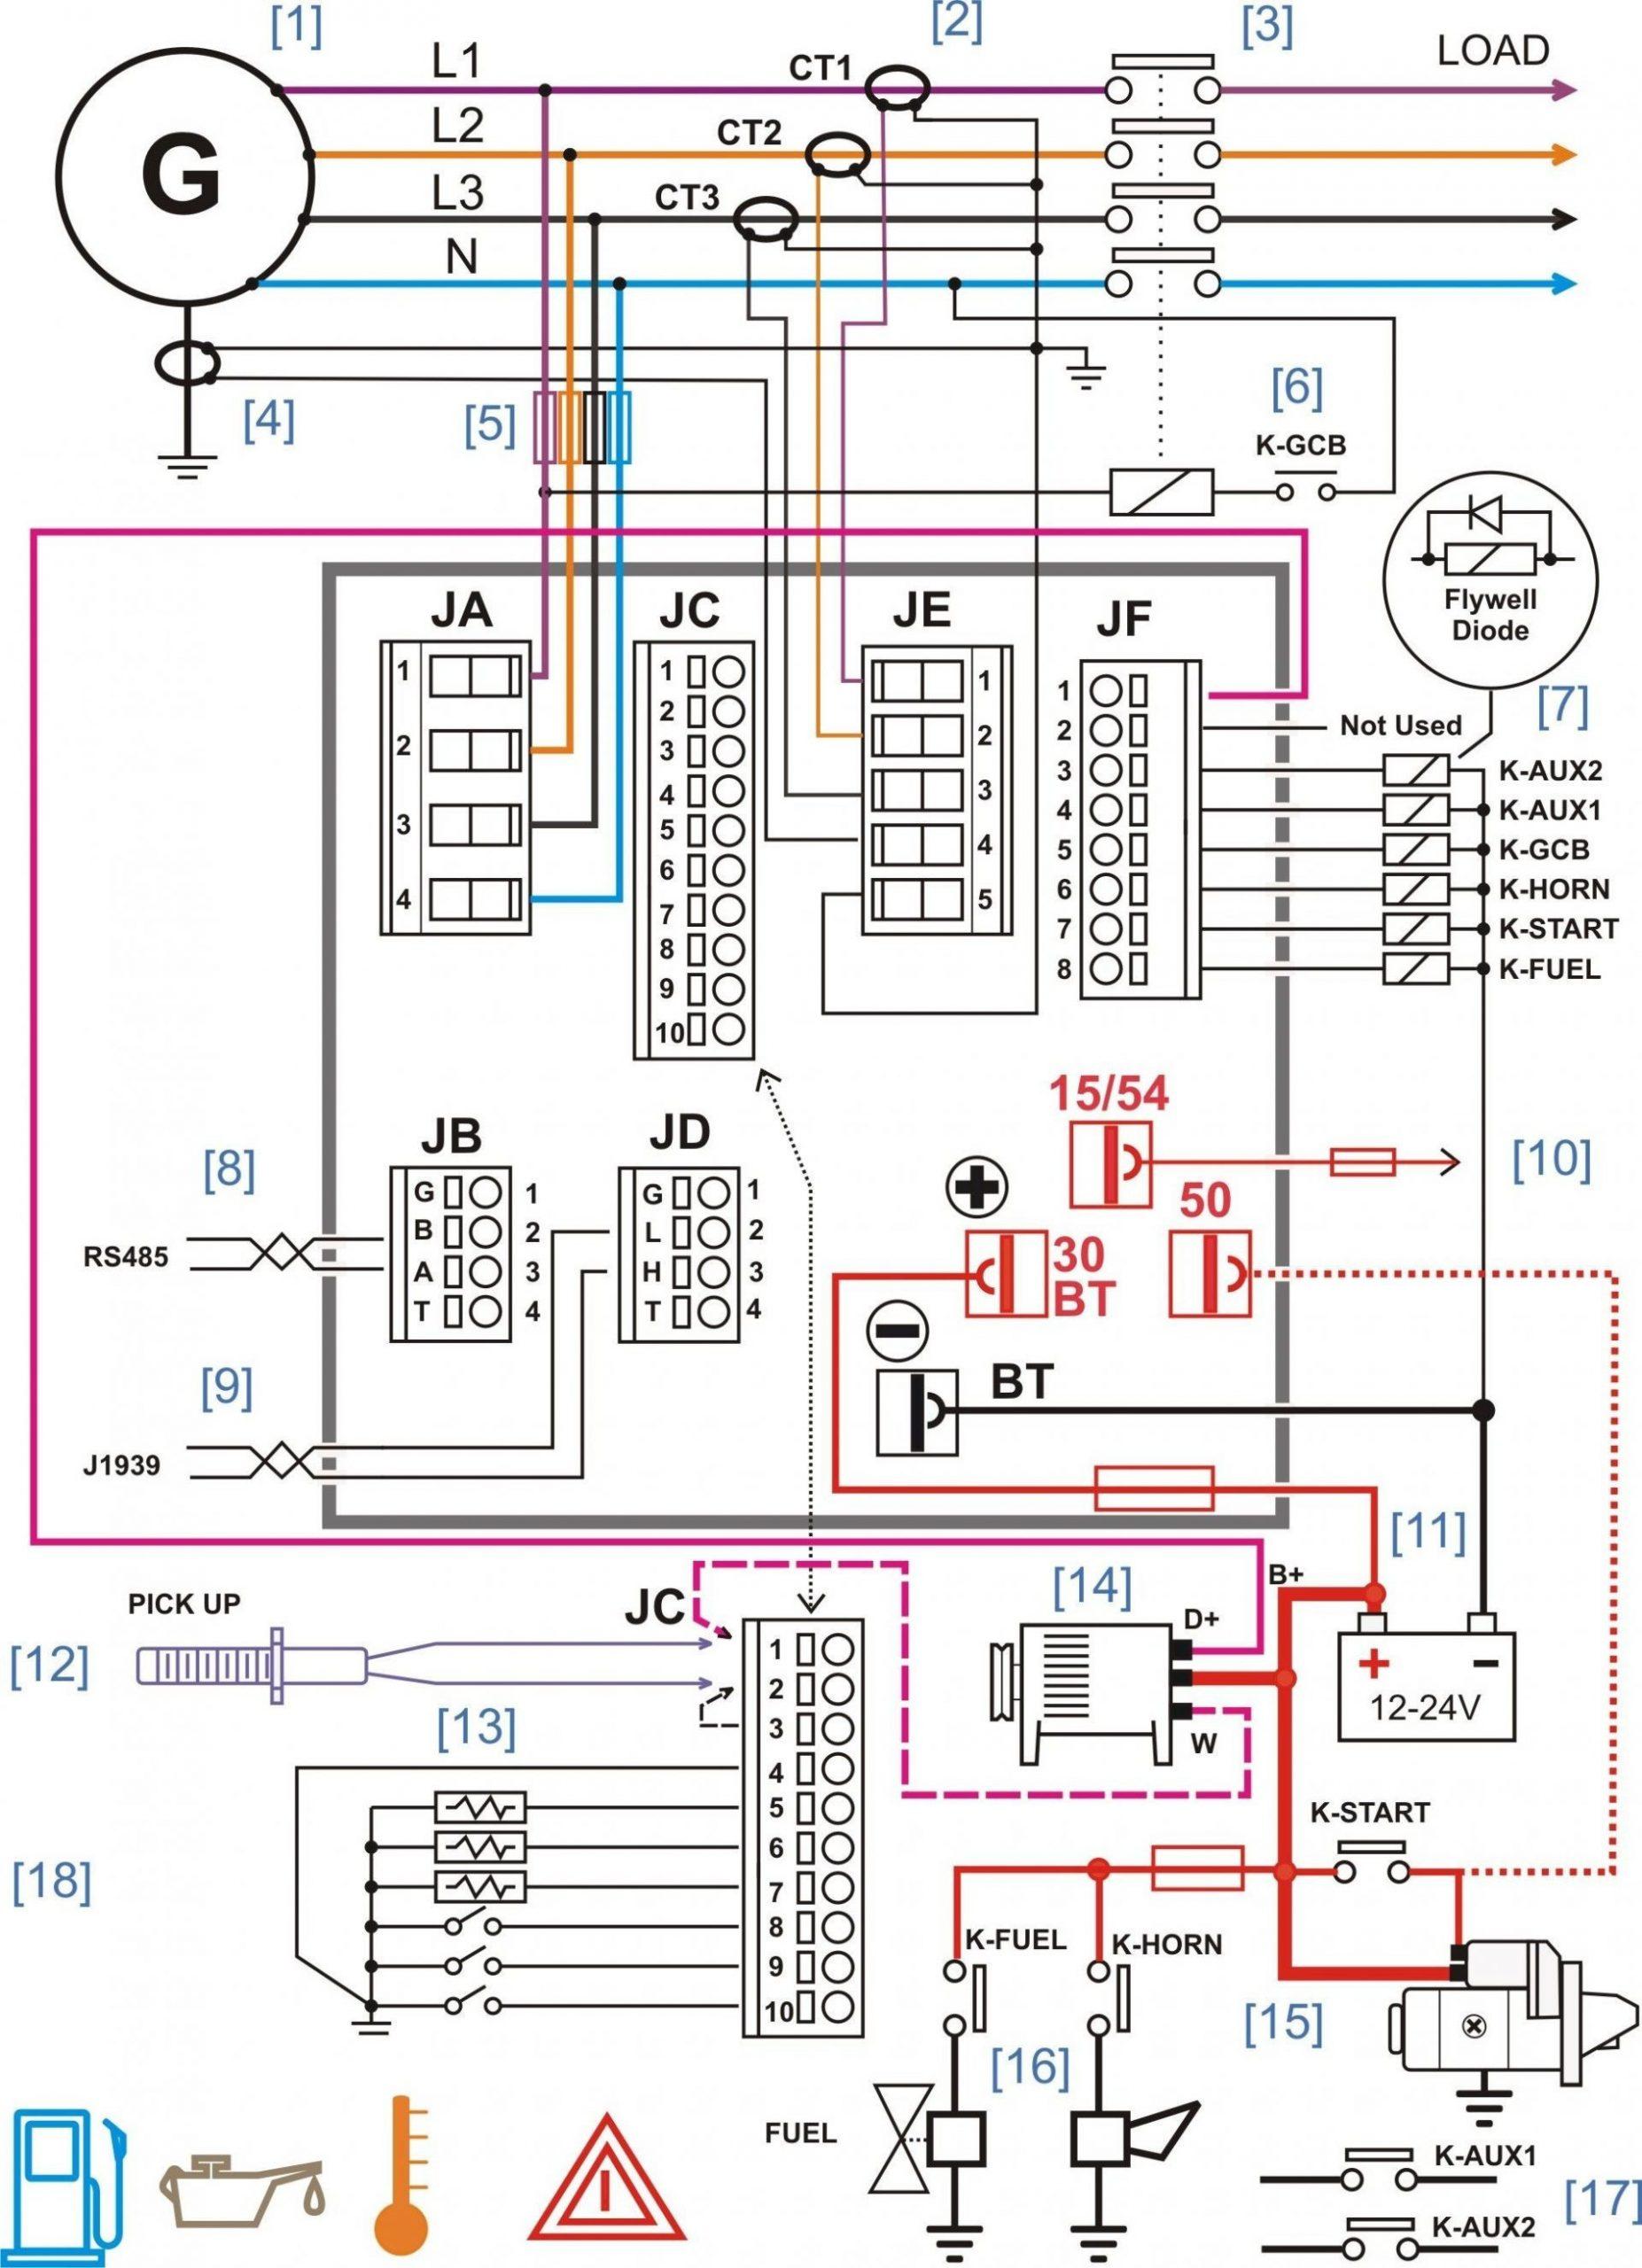 Kib Holding Tank Monitor Wiring Diagram for K21 Diagram] Kib Monitor Panel Wiring Diagram Full Version Hd Quality … Of Kib Holding Tank Monitor Wiring Diagram for K21